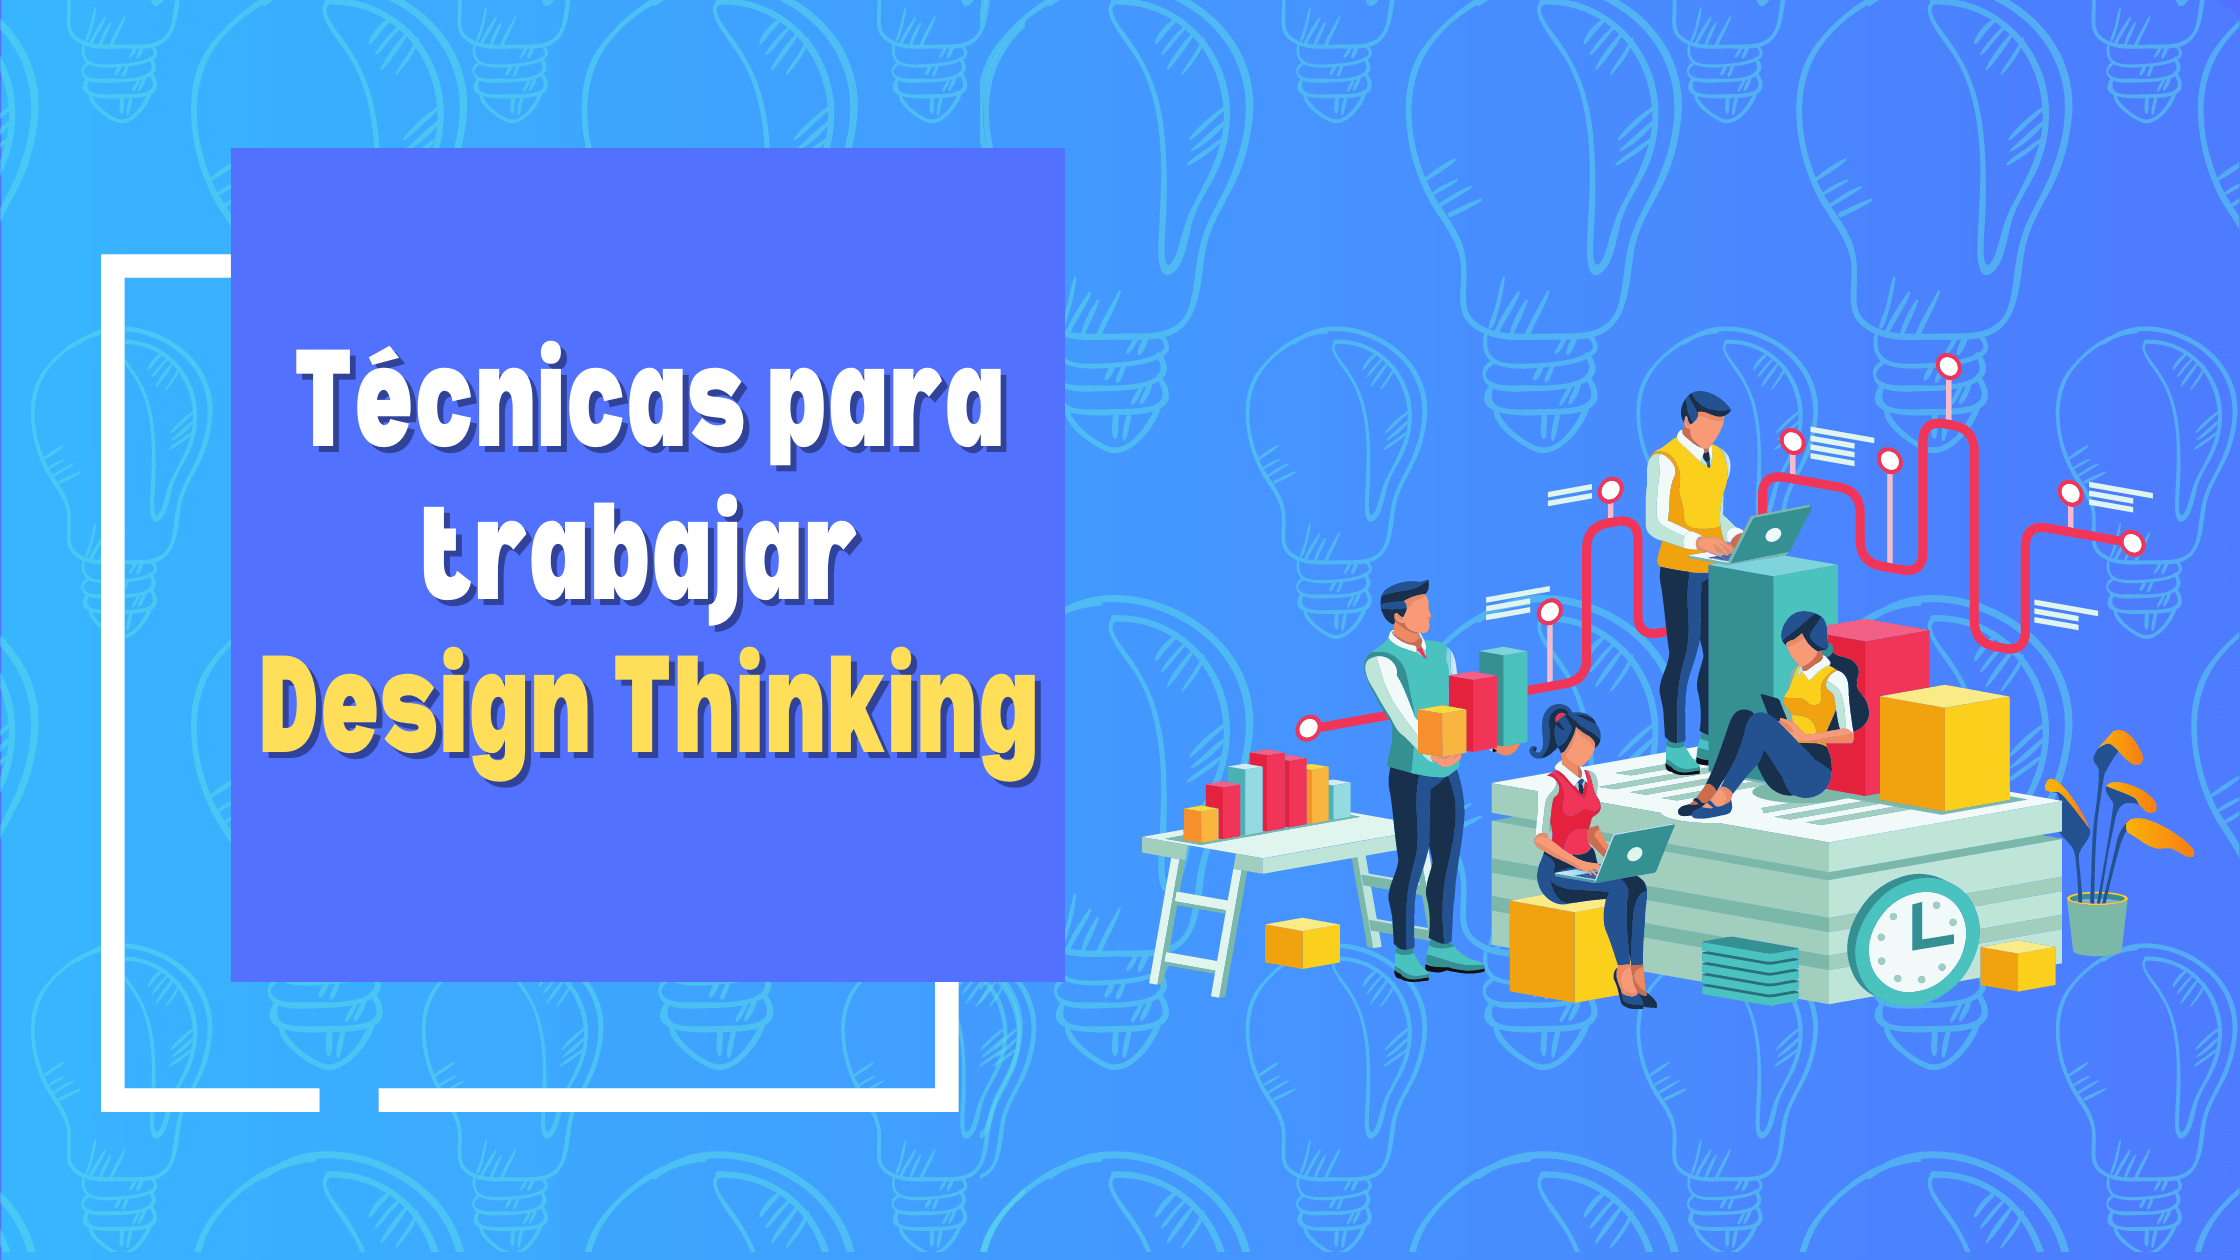 Técnicas para trabajar Design Thinking